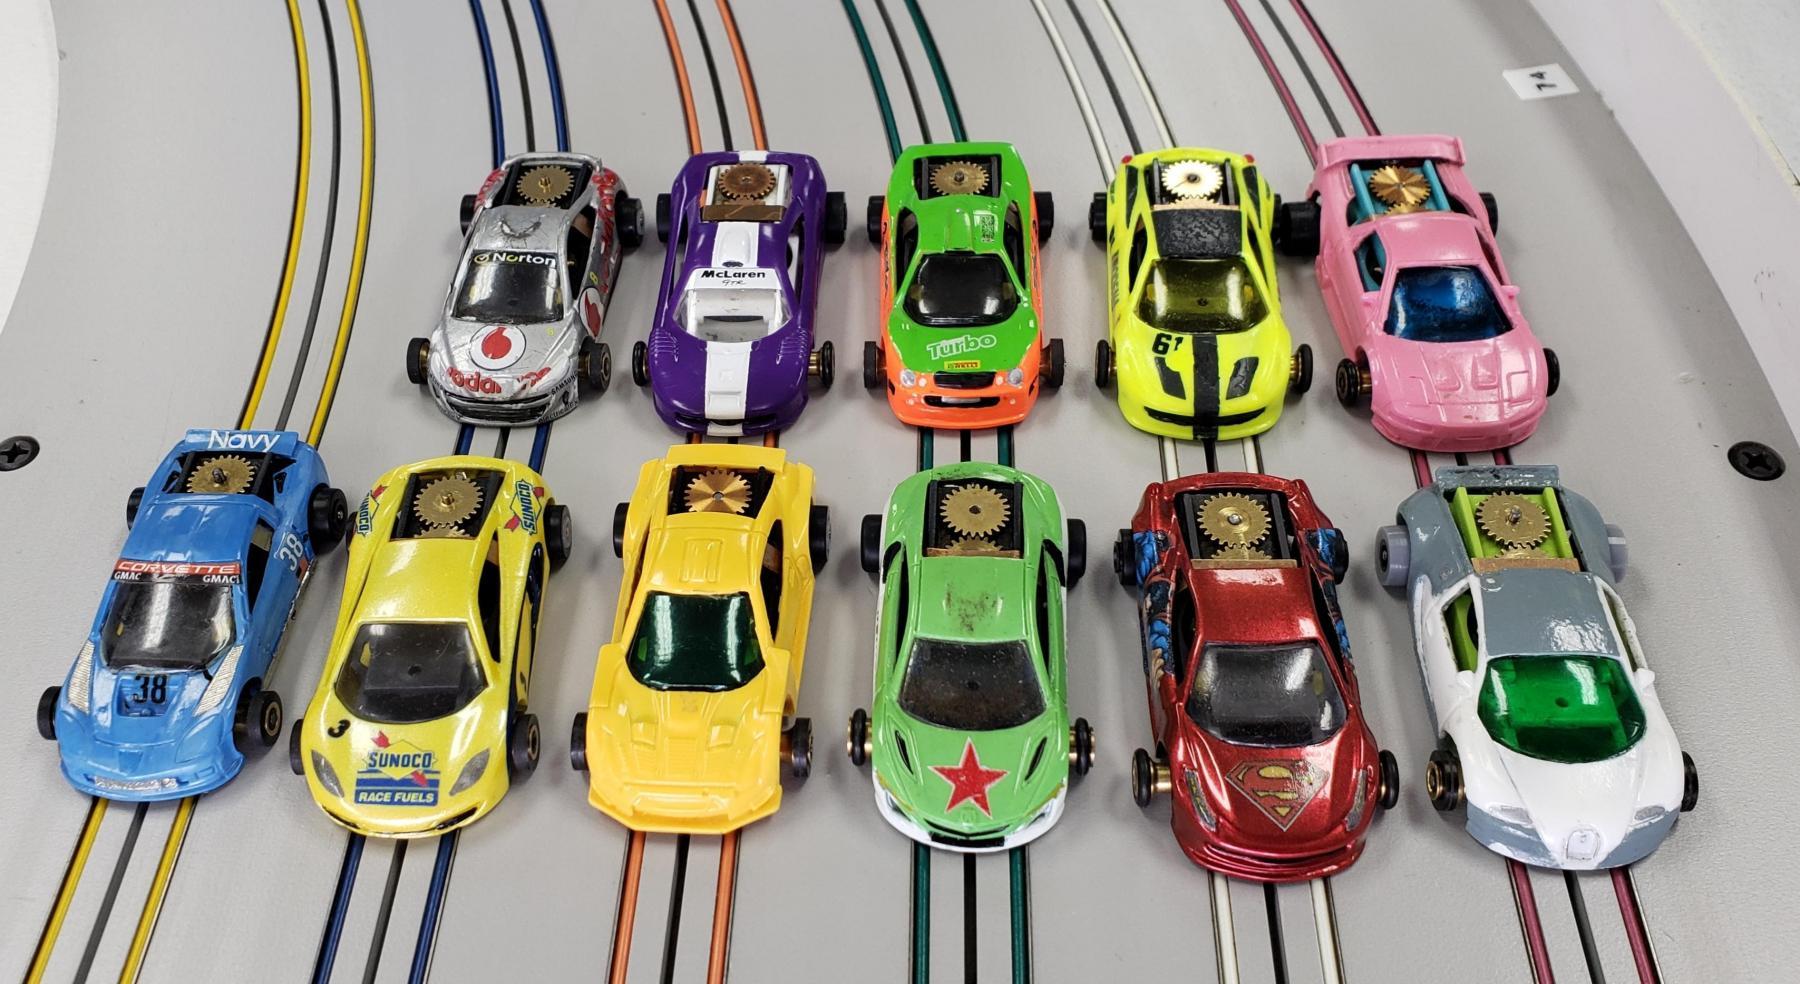 2-27 E-Fray cars.jpg